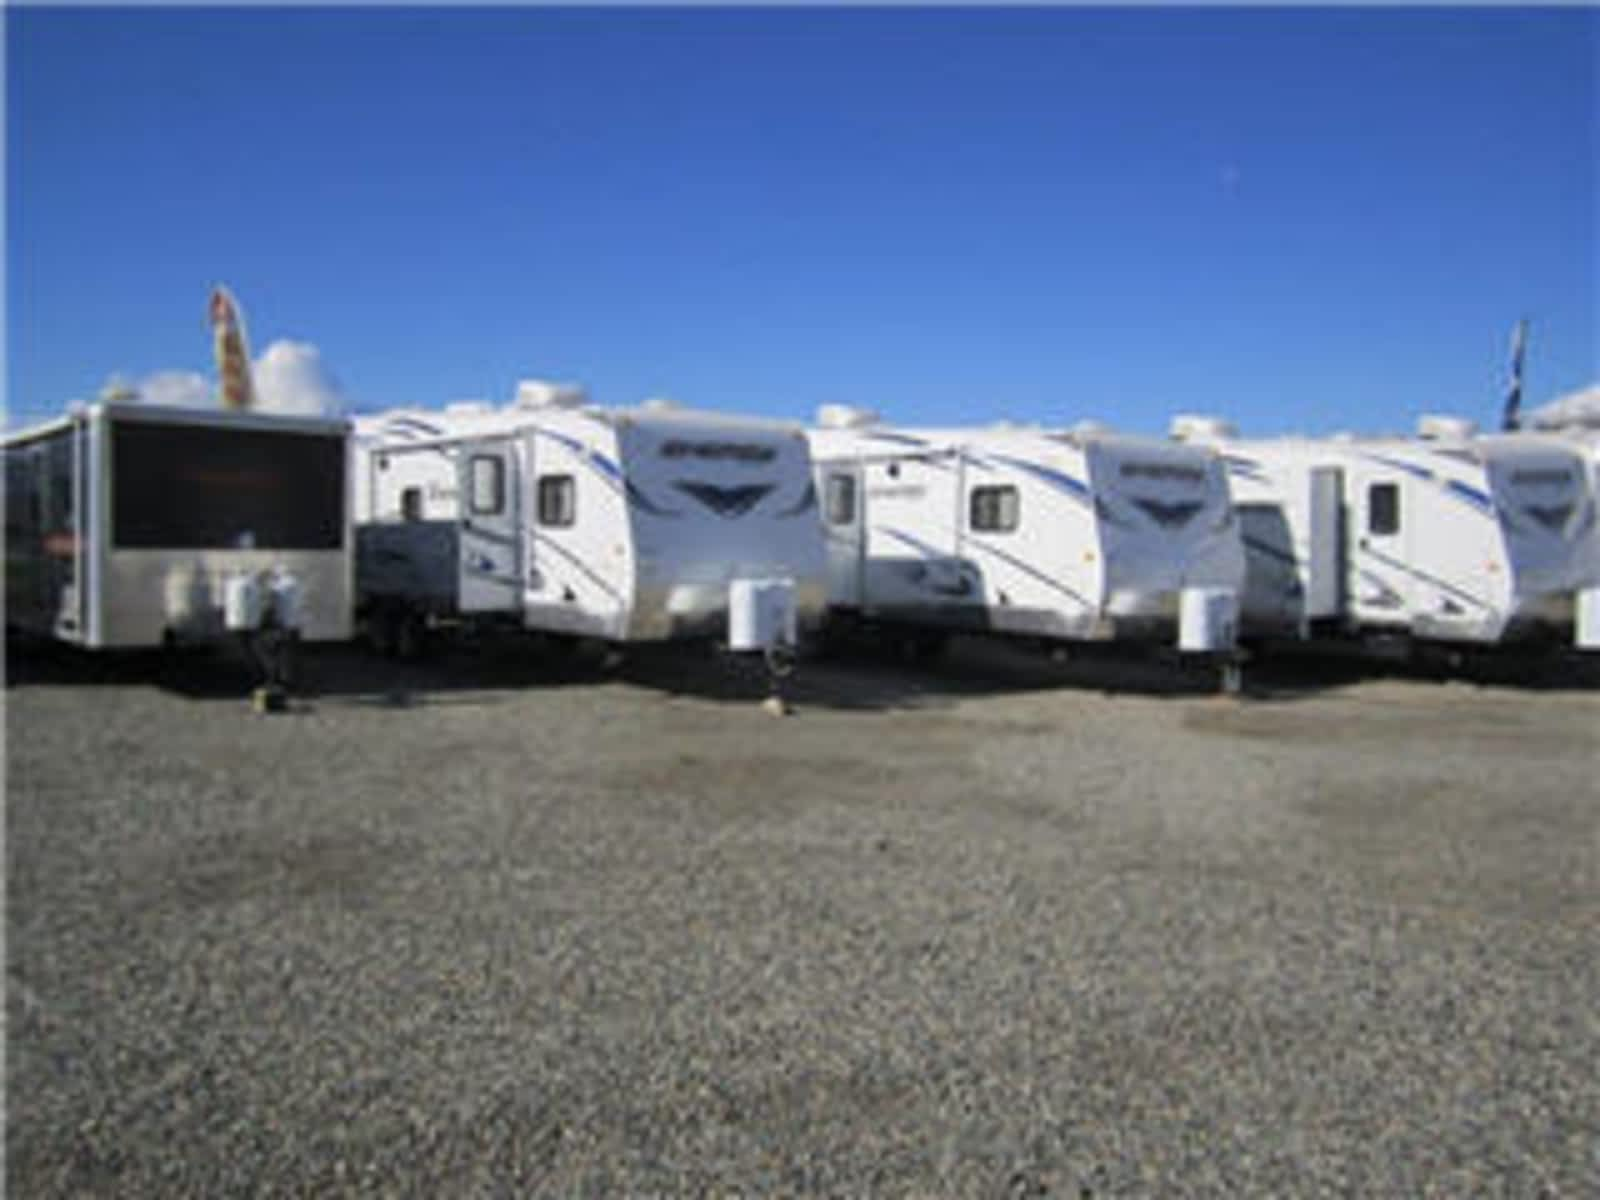 Fraserway Rv Kamloops >> Fraserway Rv Lp Opening Hours 1300 Chief Louis Way